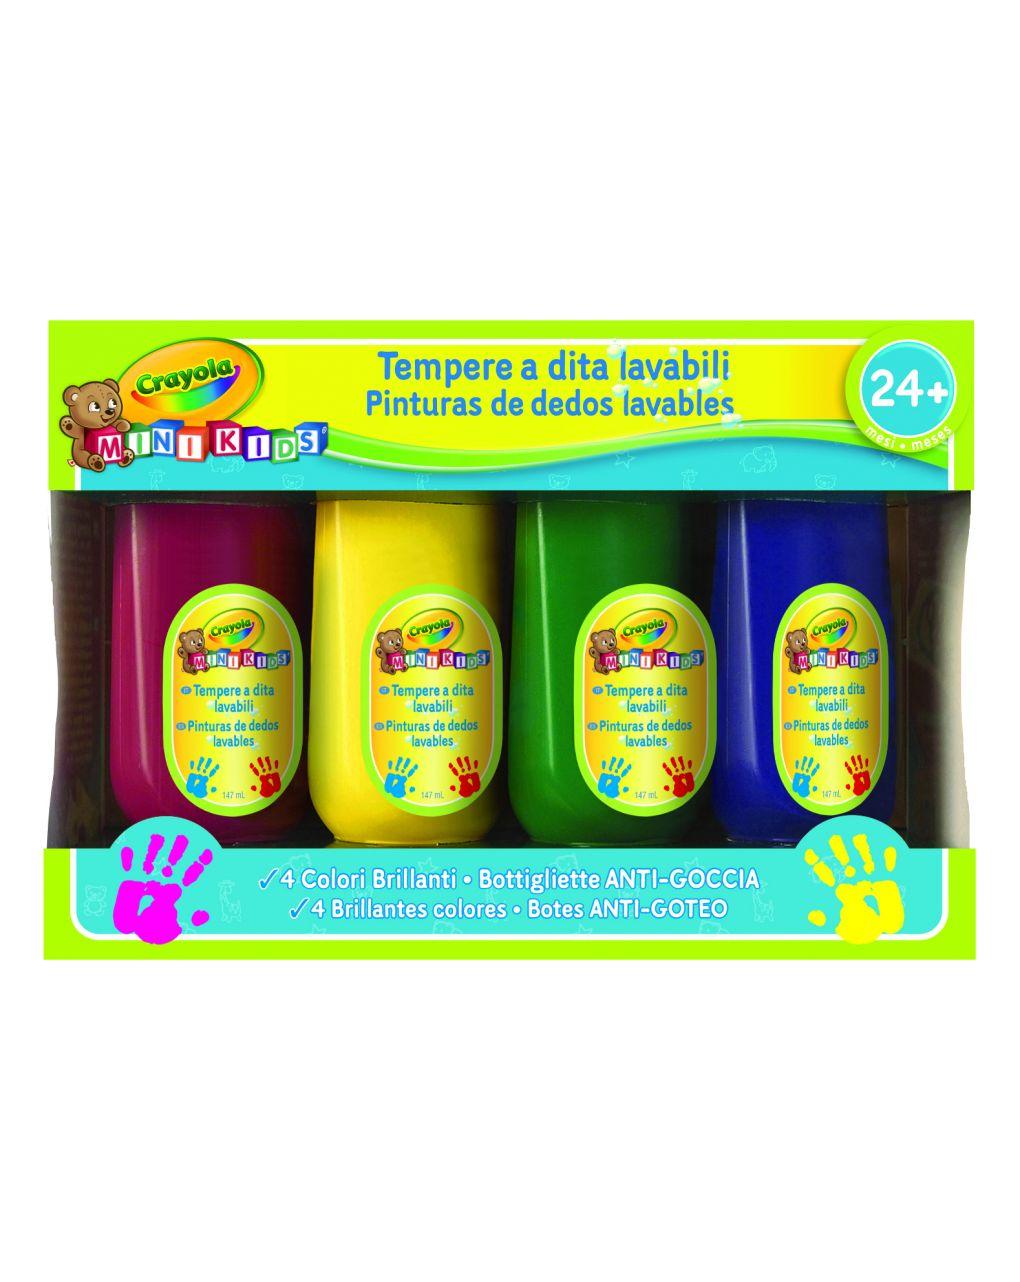 Crayola - 4 mini tintas para crianças laváveis aos dedos - Crayola